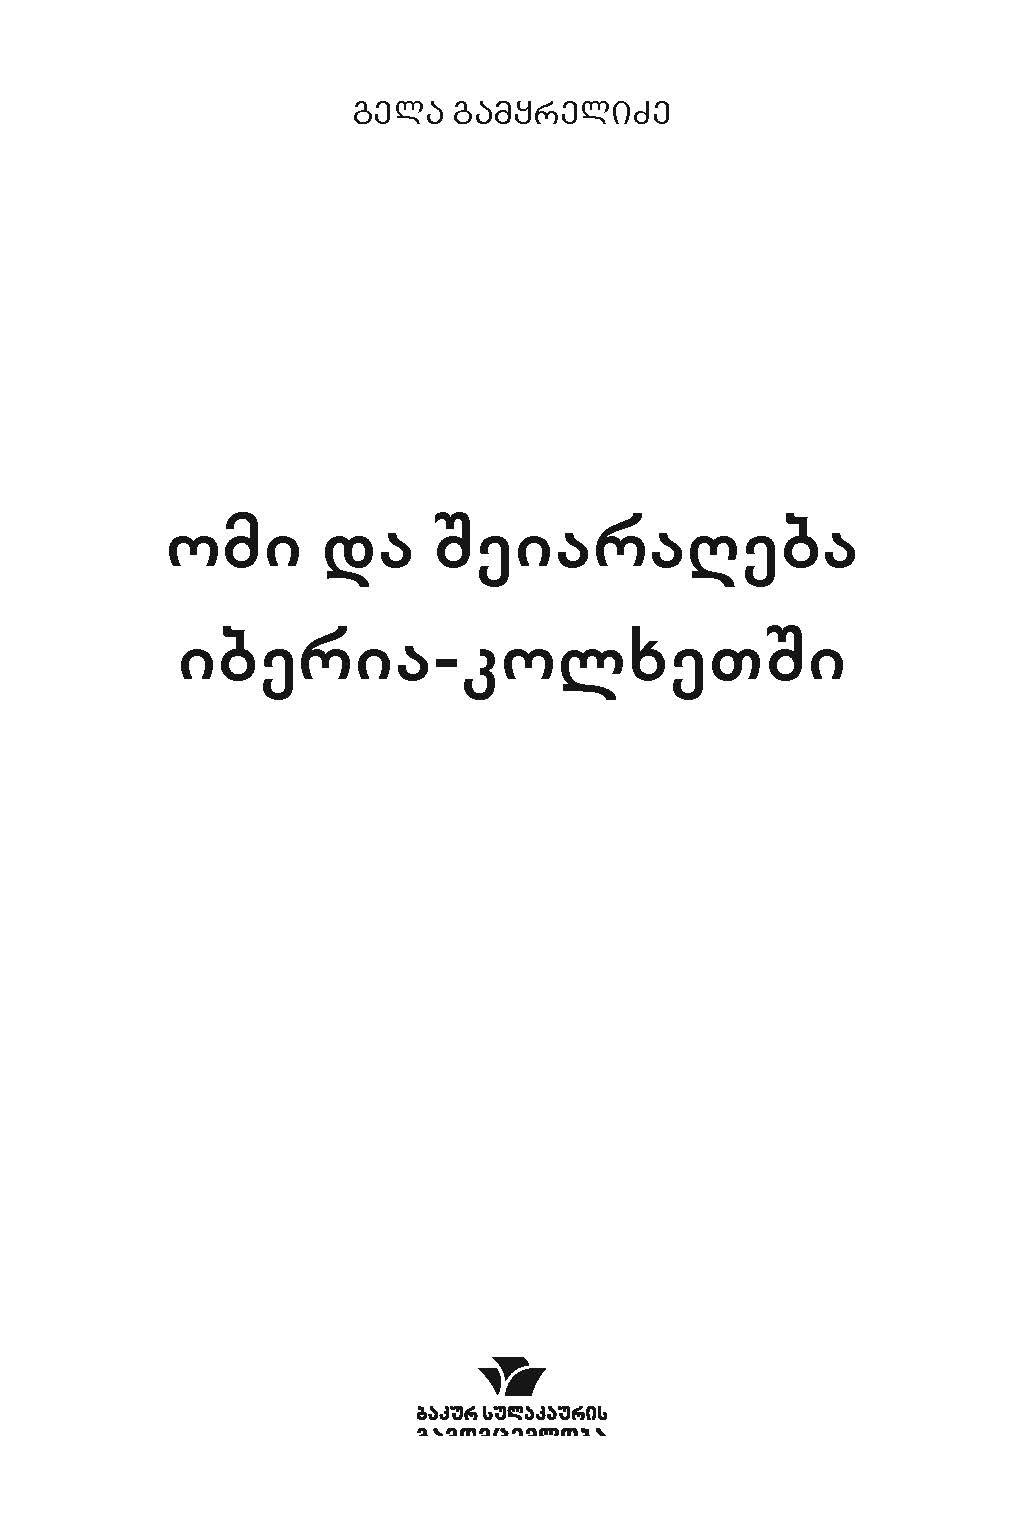 Omi_Da_Sheiarageba